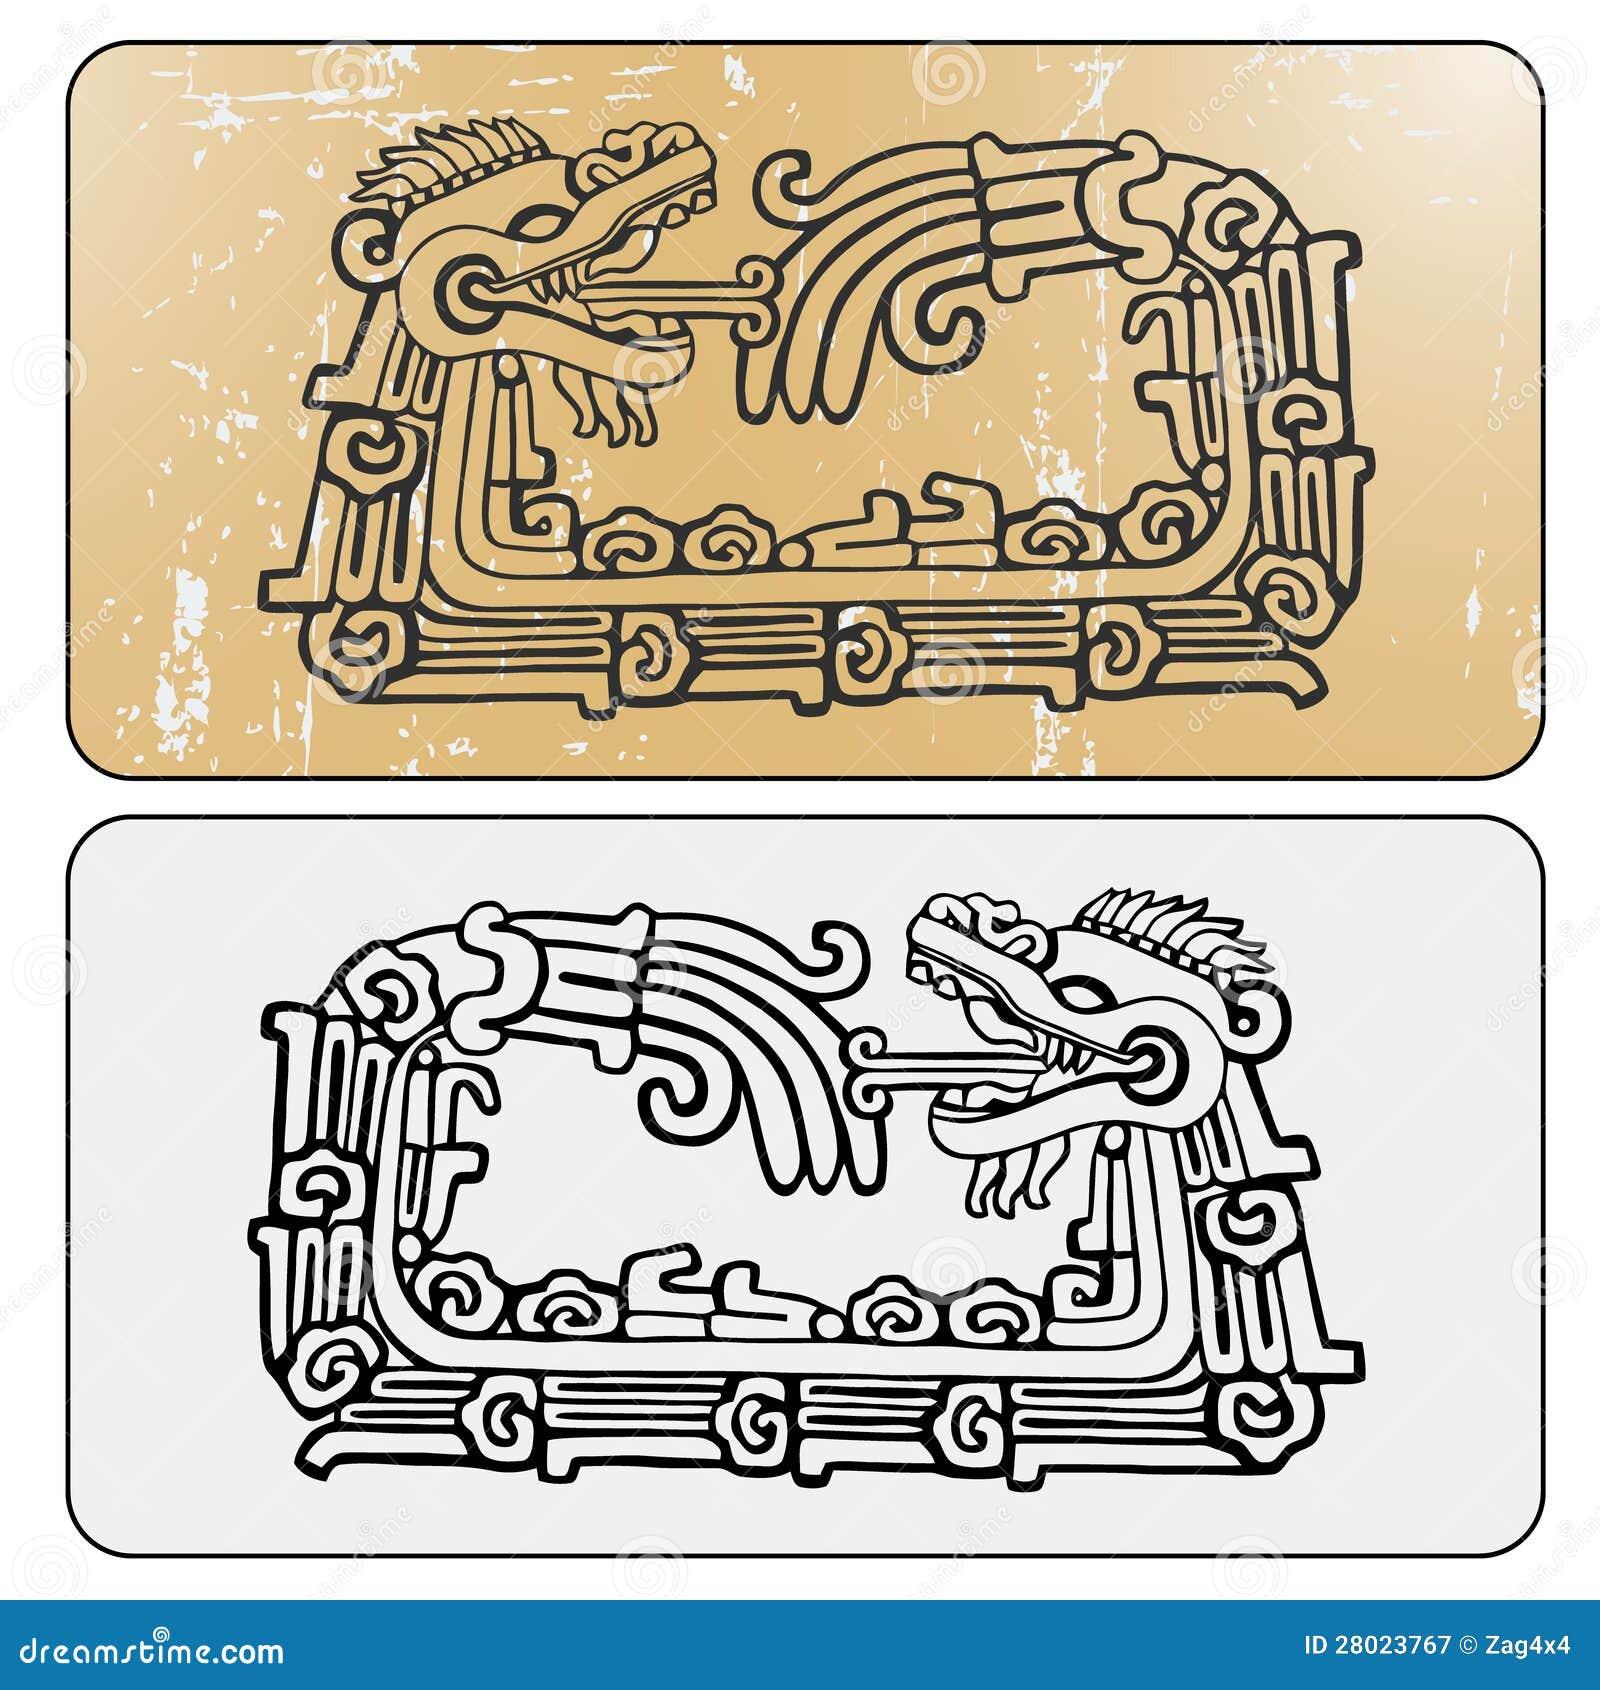 http://thumbs.dreamstime.com/z/double-maya-snake-quetzalcoatl-ouroboros-28023767.jpg